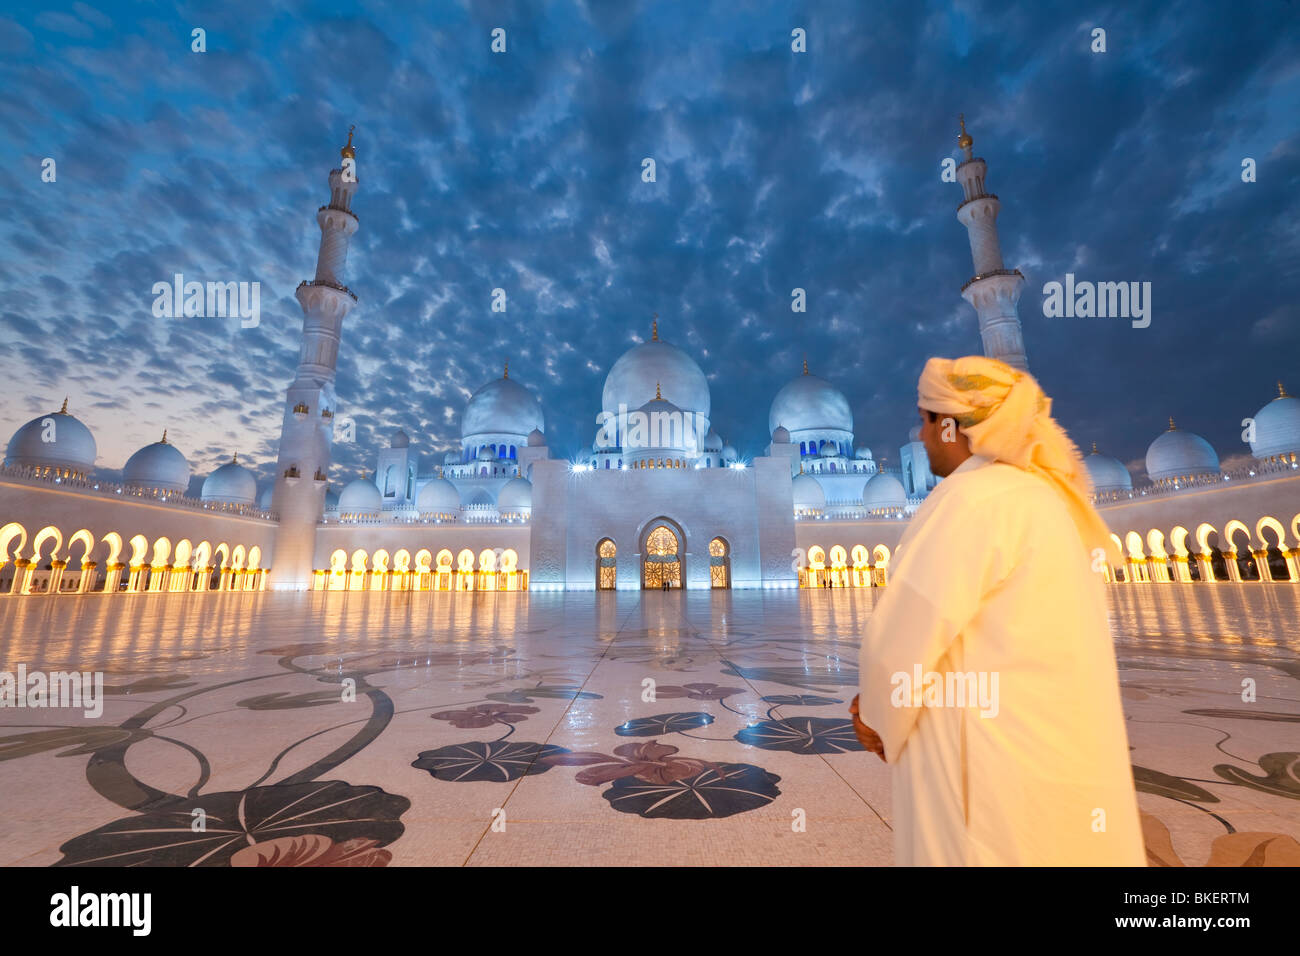 Mosquée Sheikh Zayed Bin Sultan Al Nahyan, Abu Dhabi, Émirats arabes unis, ÉMIRATS ARABES UNIS - Photo Stock